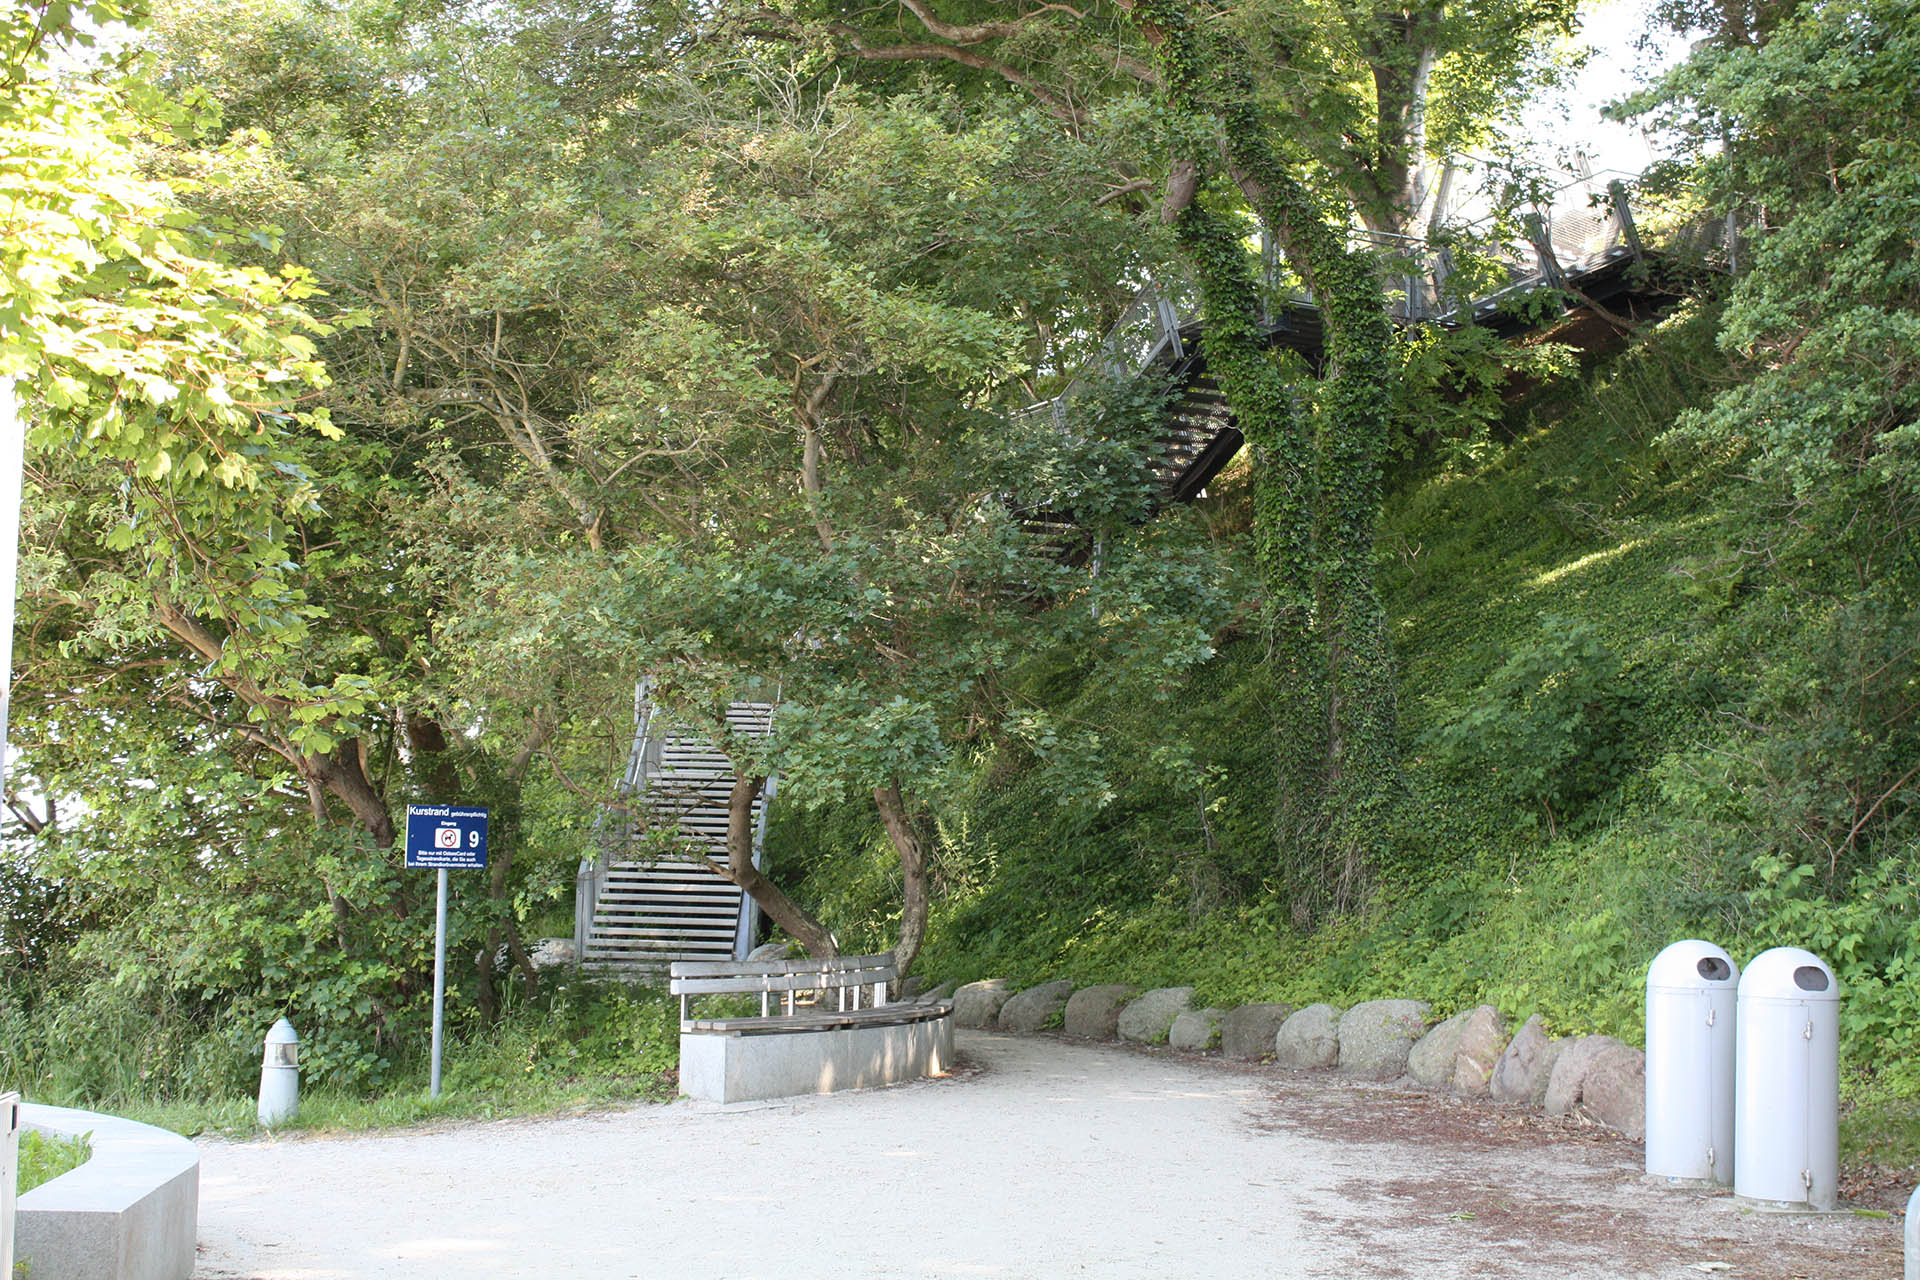 malerhaus-kuhse-spazier-und-wanderwege-02